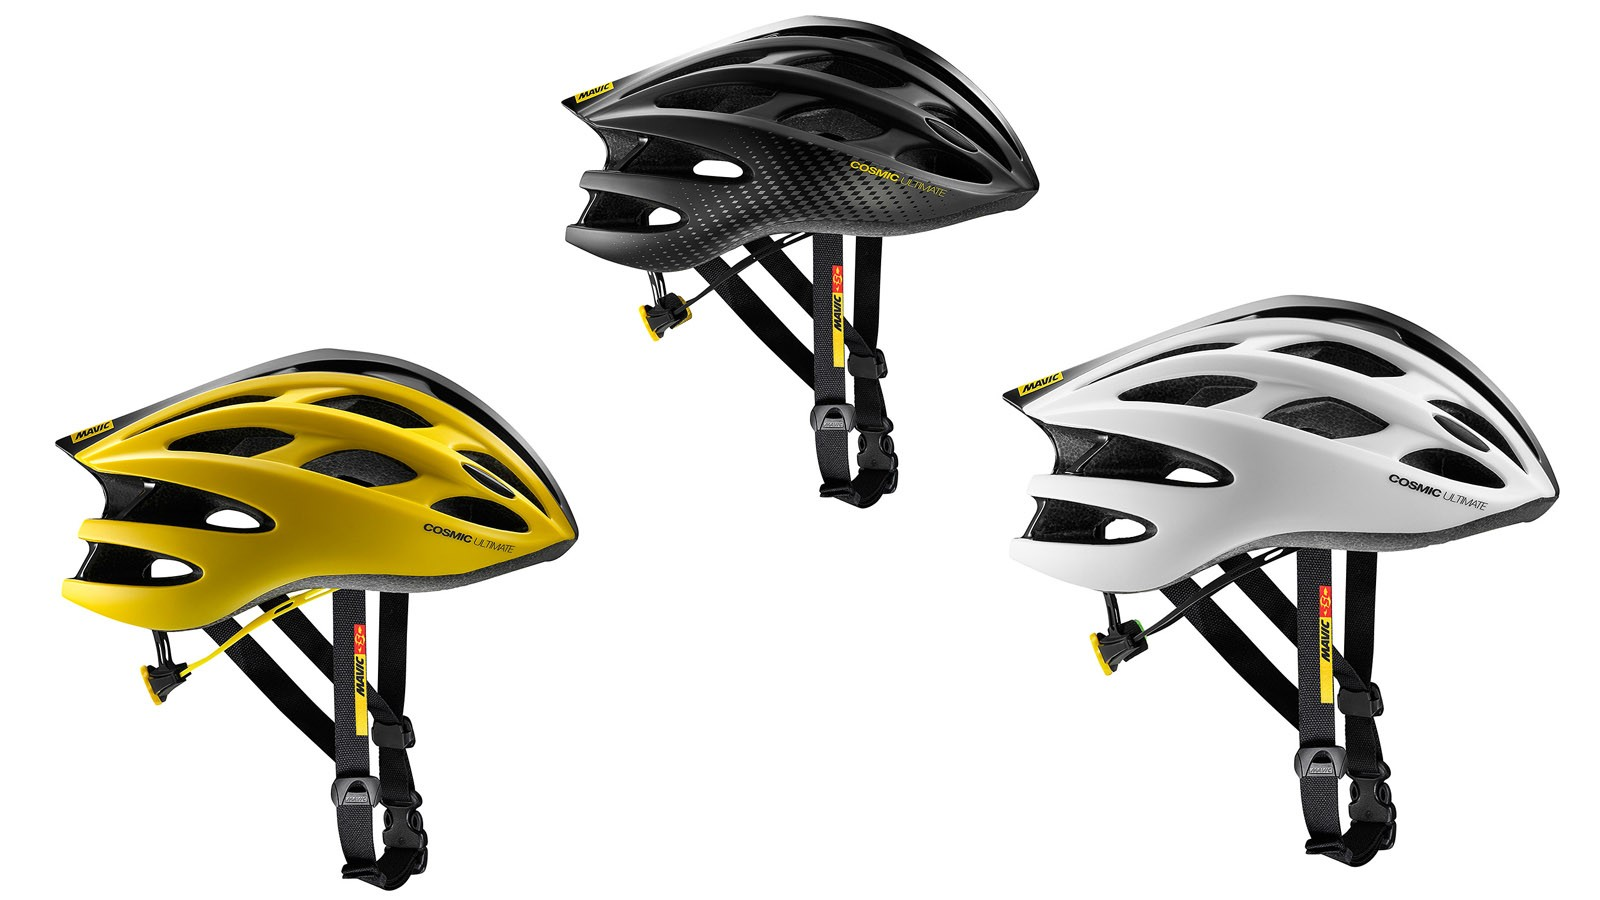 The Cosmic Ultimate II is Mavic's new flagship road helmet